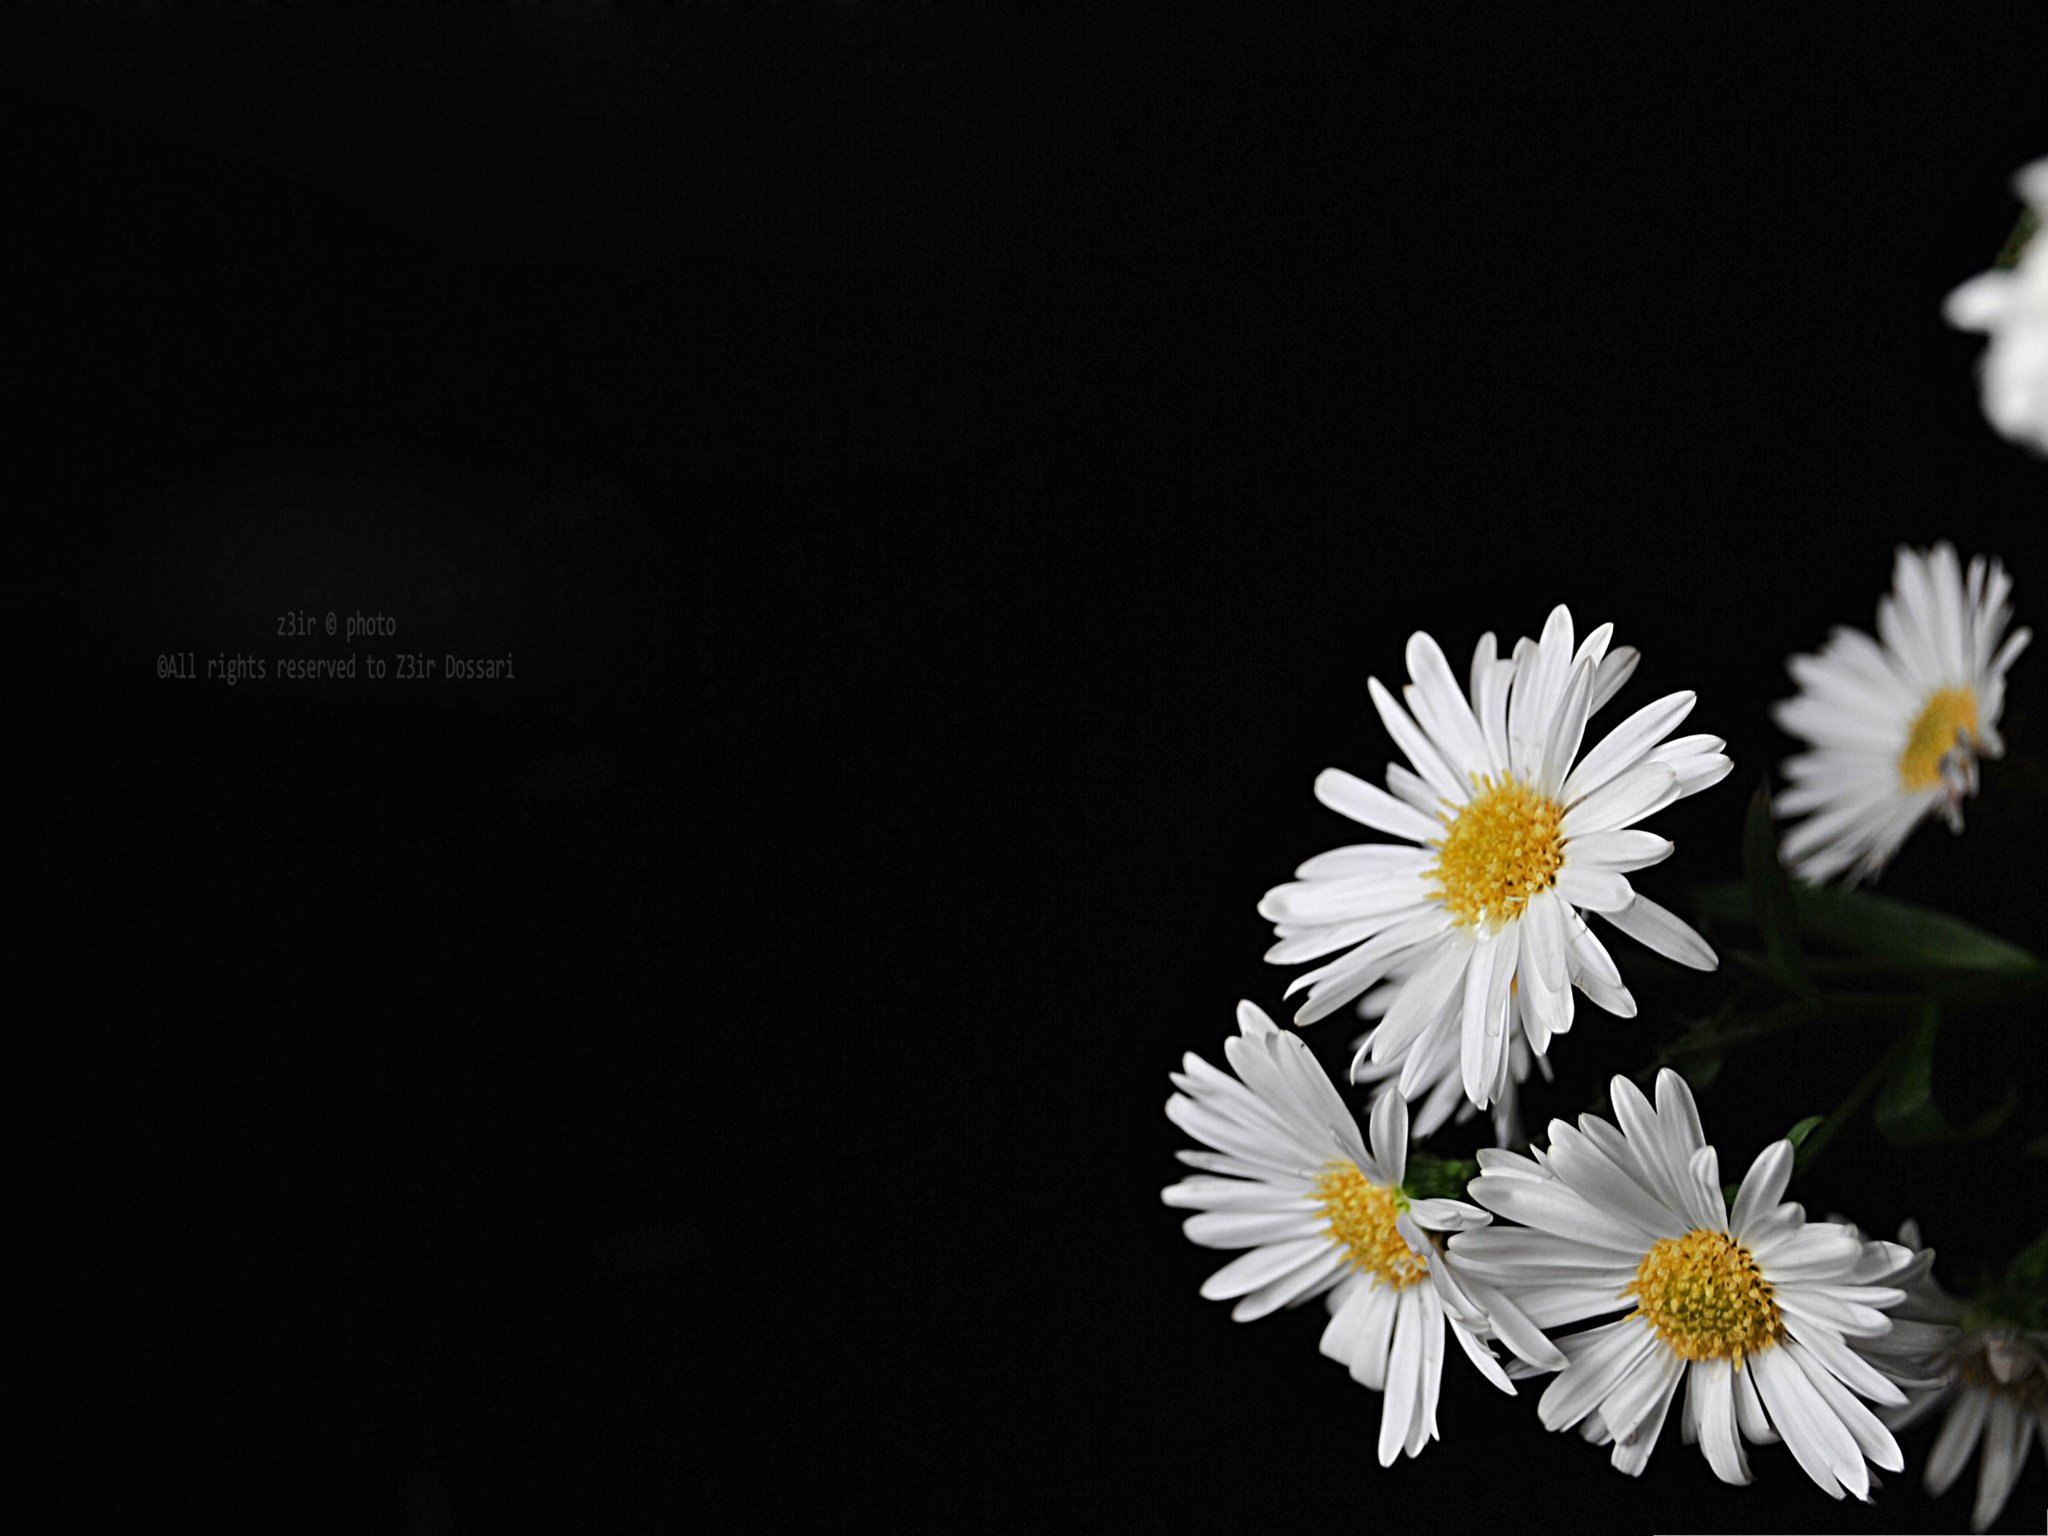 Flowers on black background wallpaper wallpapersafari flowers put against black background 2048x1536 wallpaper download 2048x1536 mightylinksfo